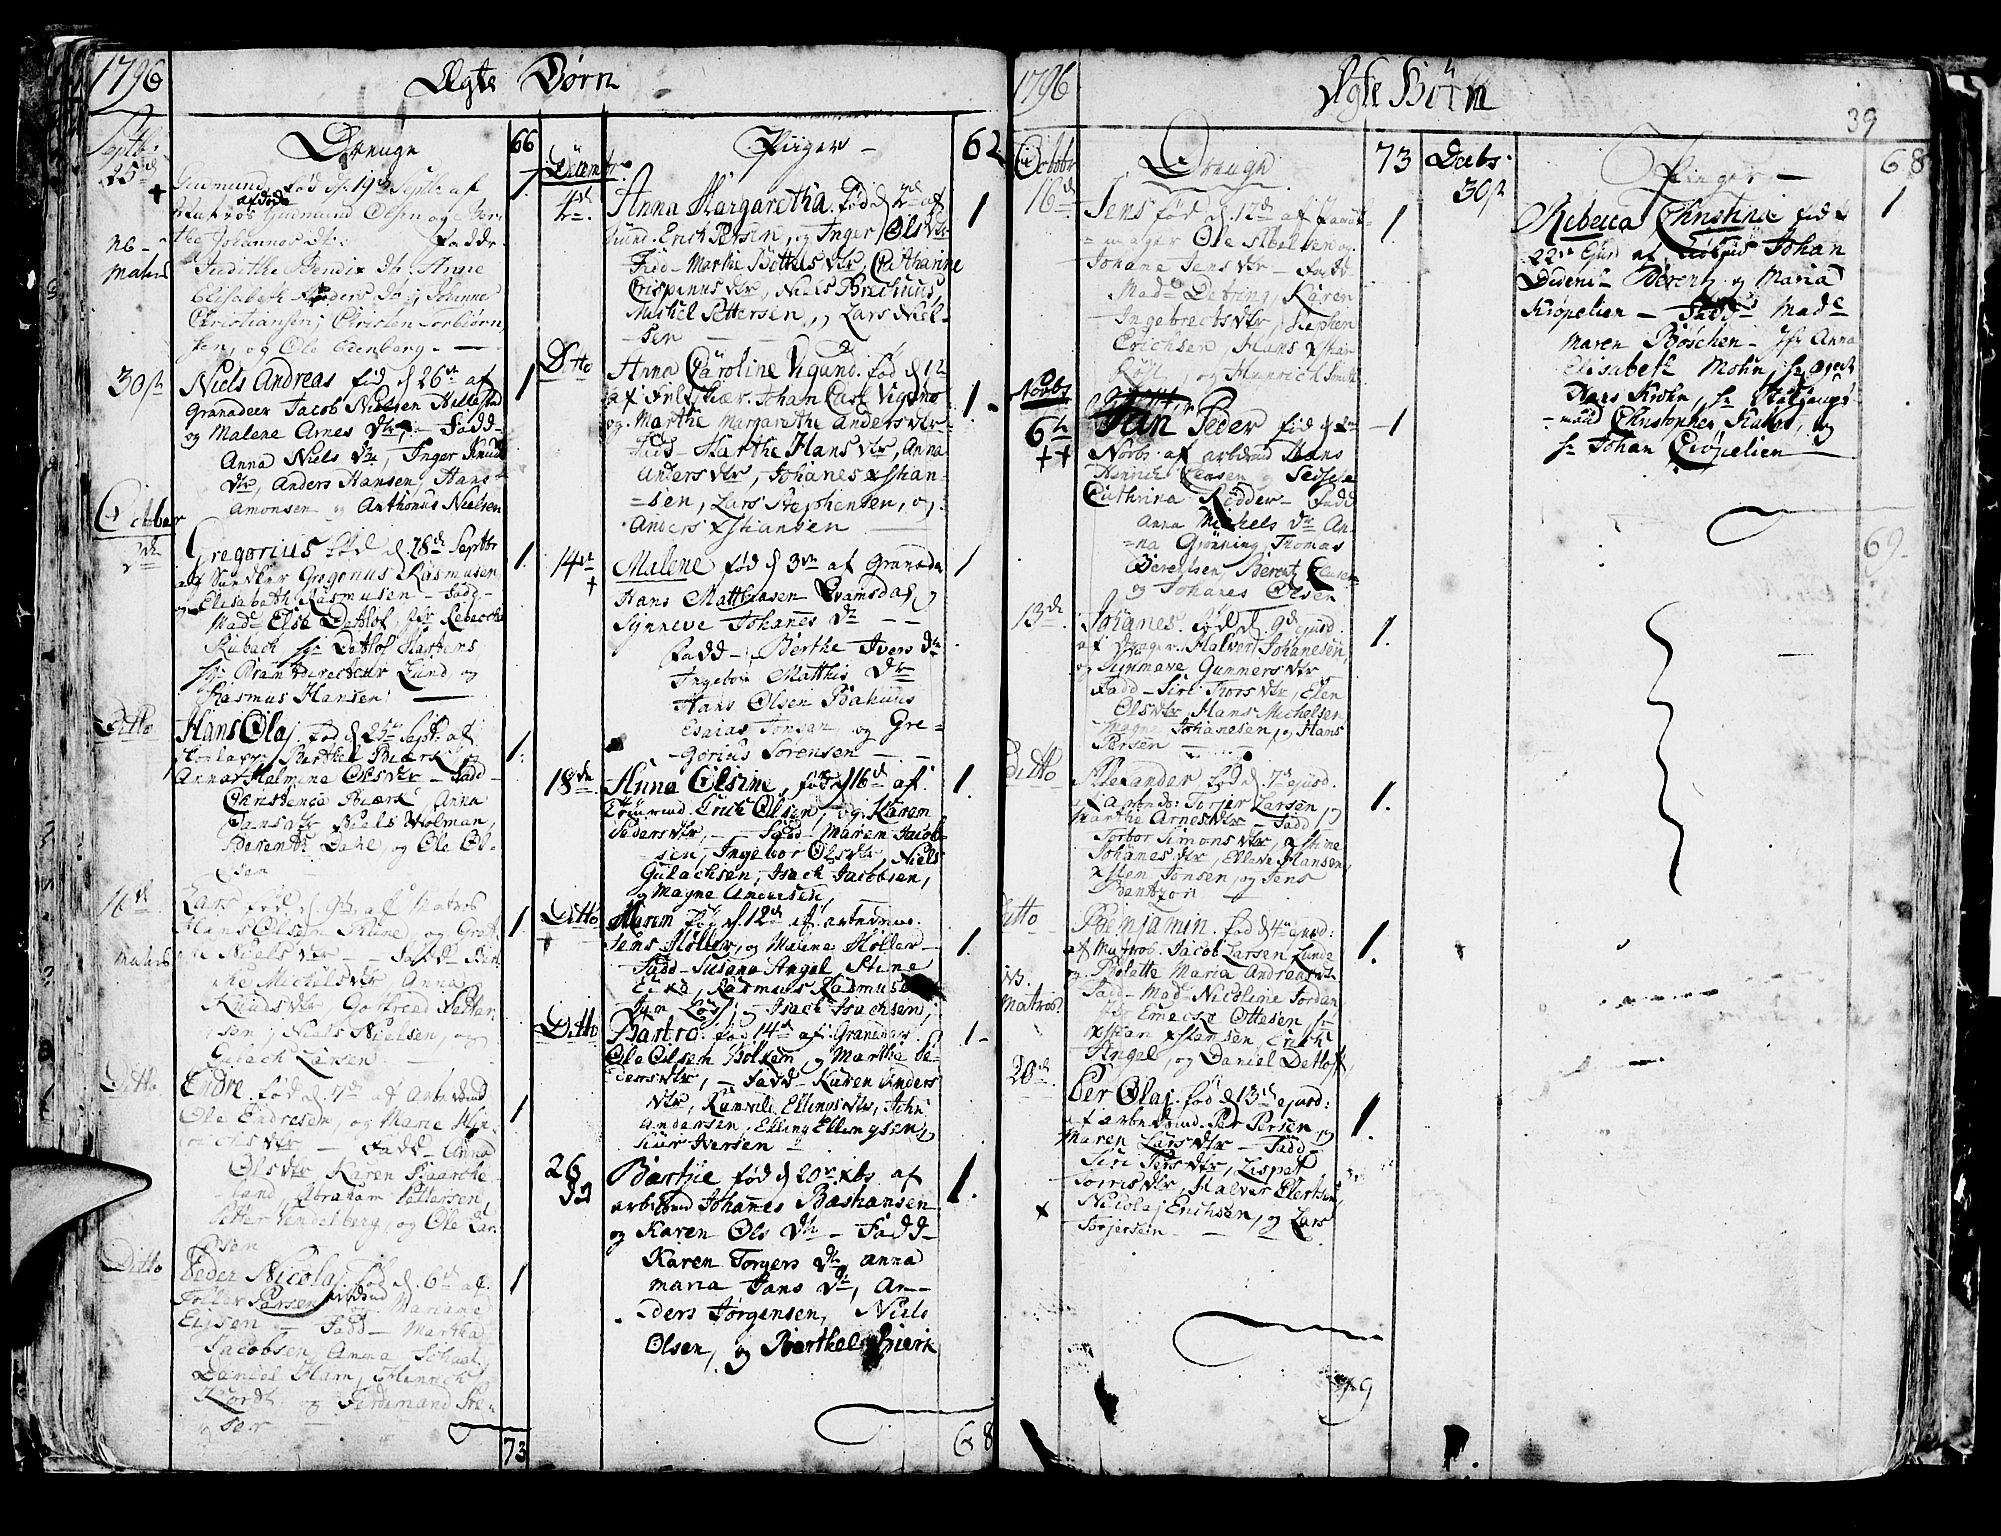 SAB, Korskirken Sokneprestembete, H/Haa/L0006: Ministerialbok nr. A 6, 1790-1820, s. 39